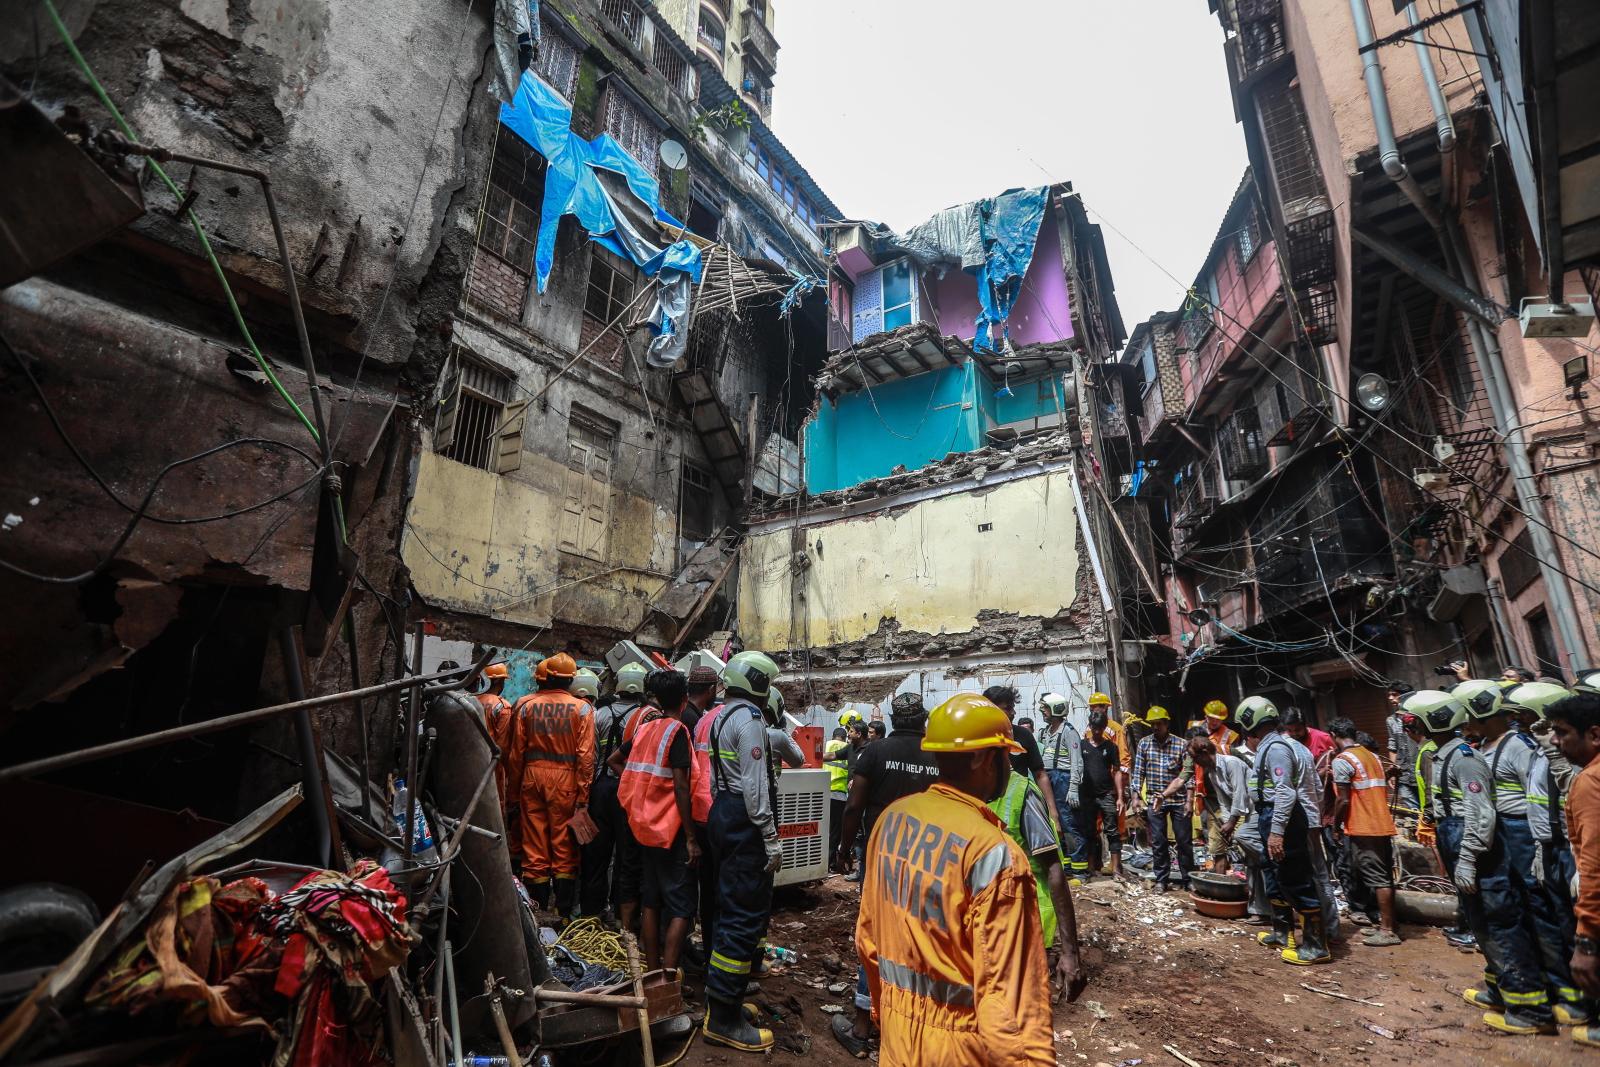 Katastrofa w Mumbai Fot. EPA/DIVYAKANT SOLANKI